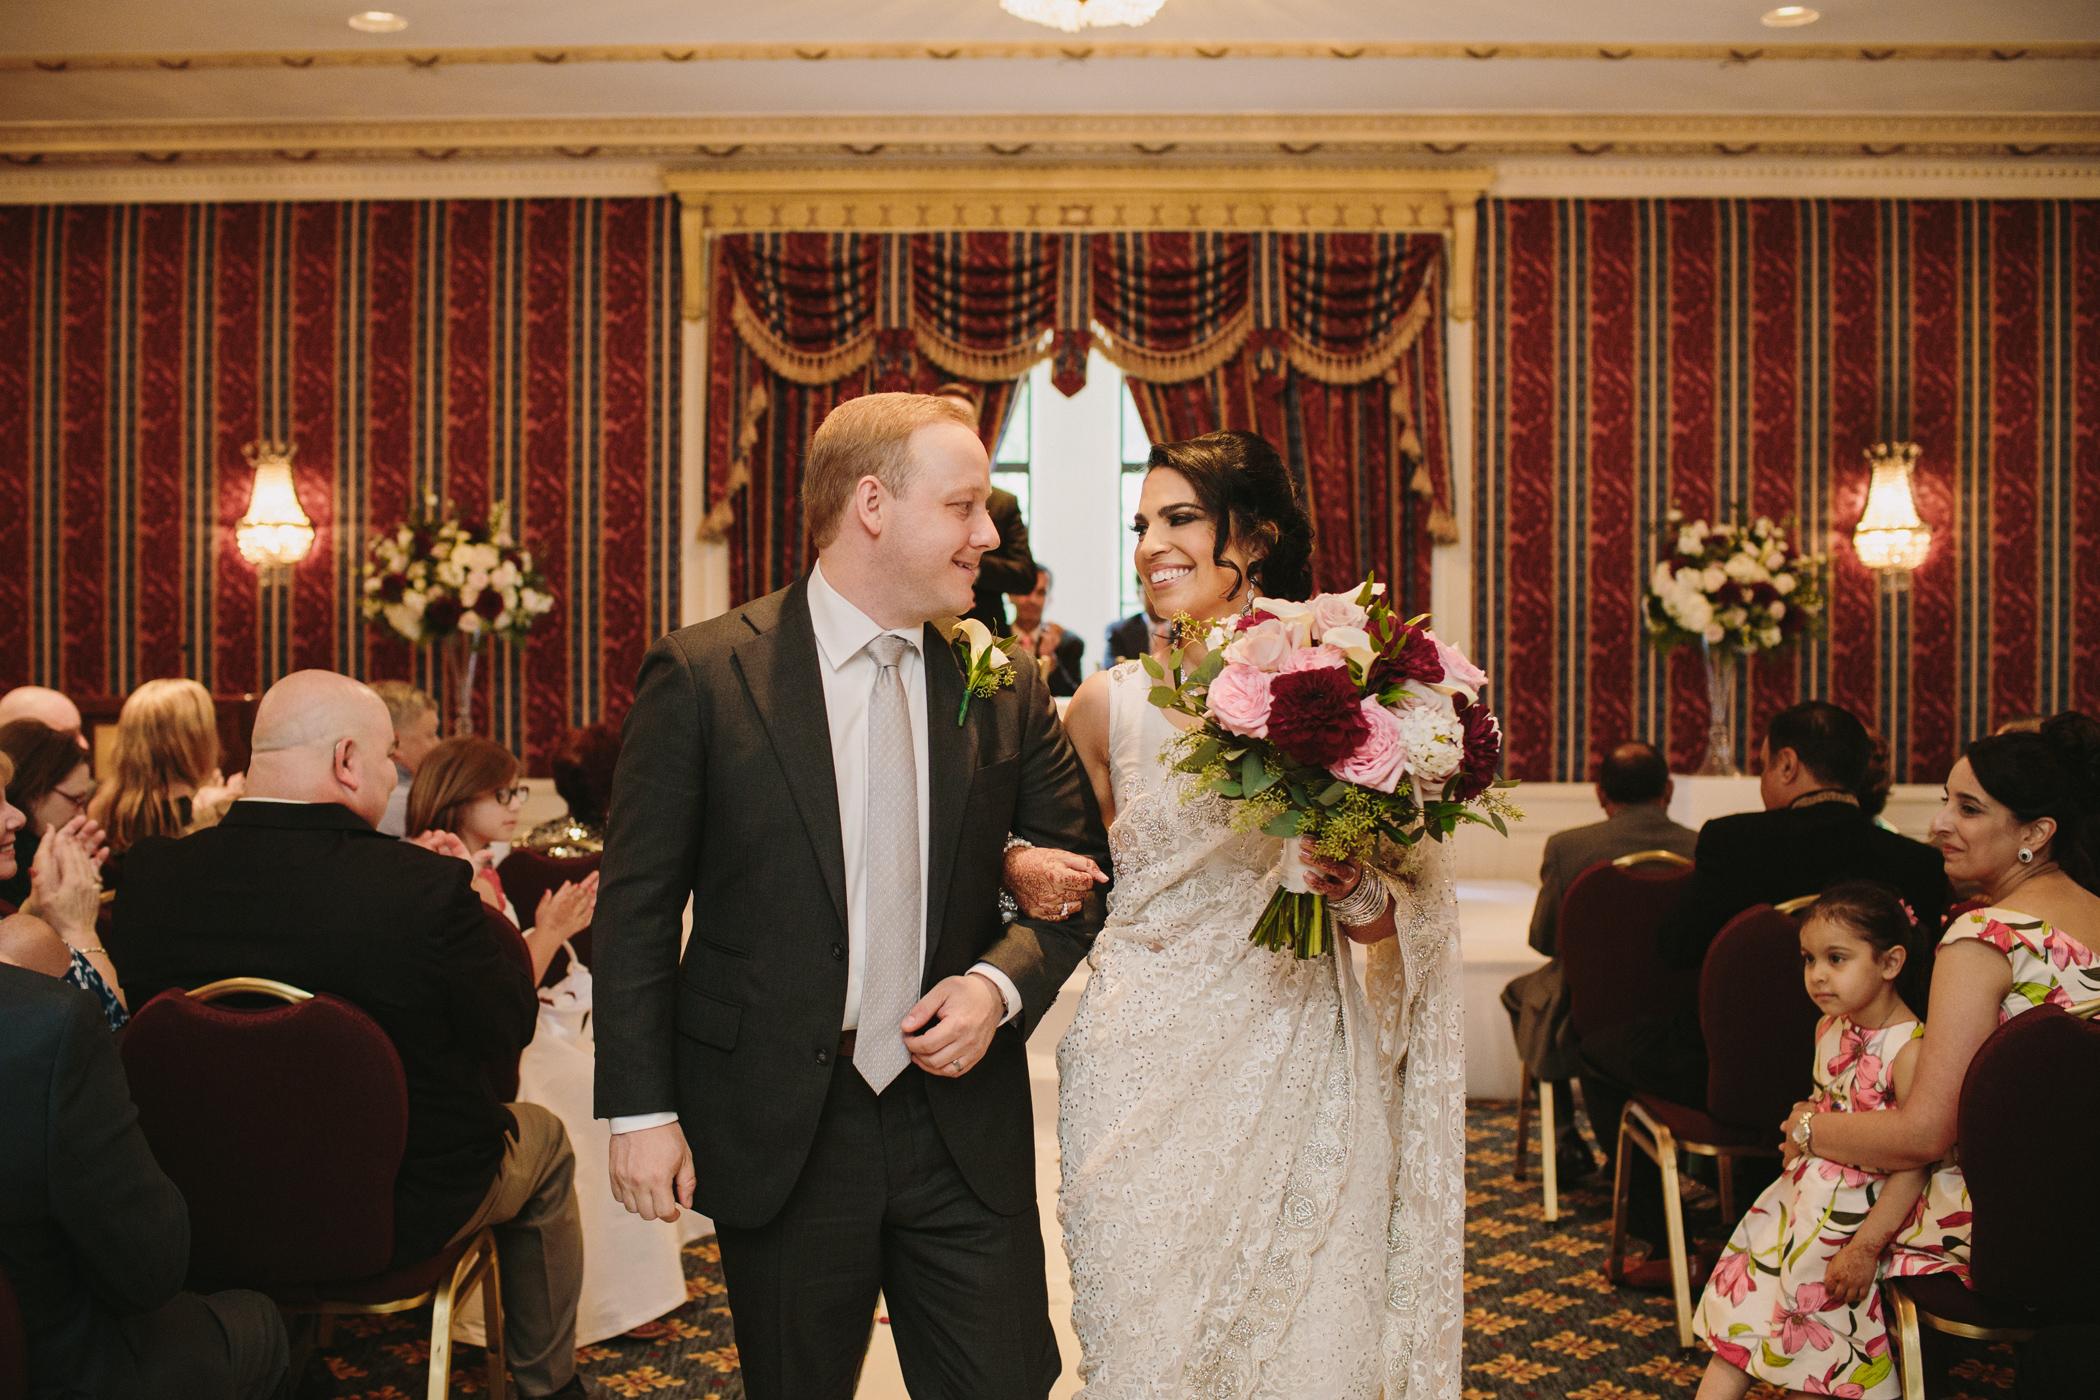 Ismaili Bride and Groom